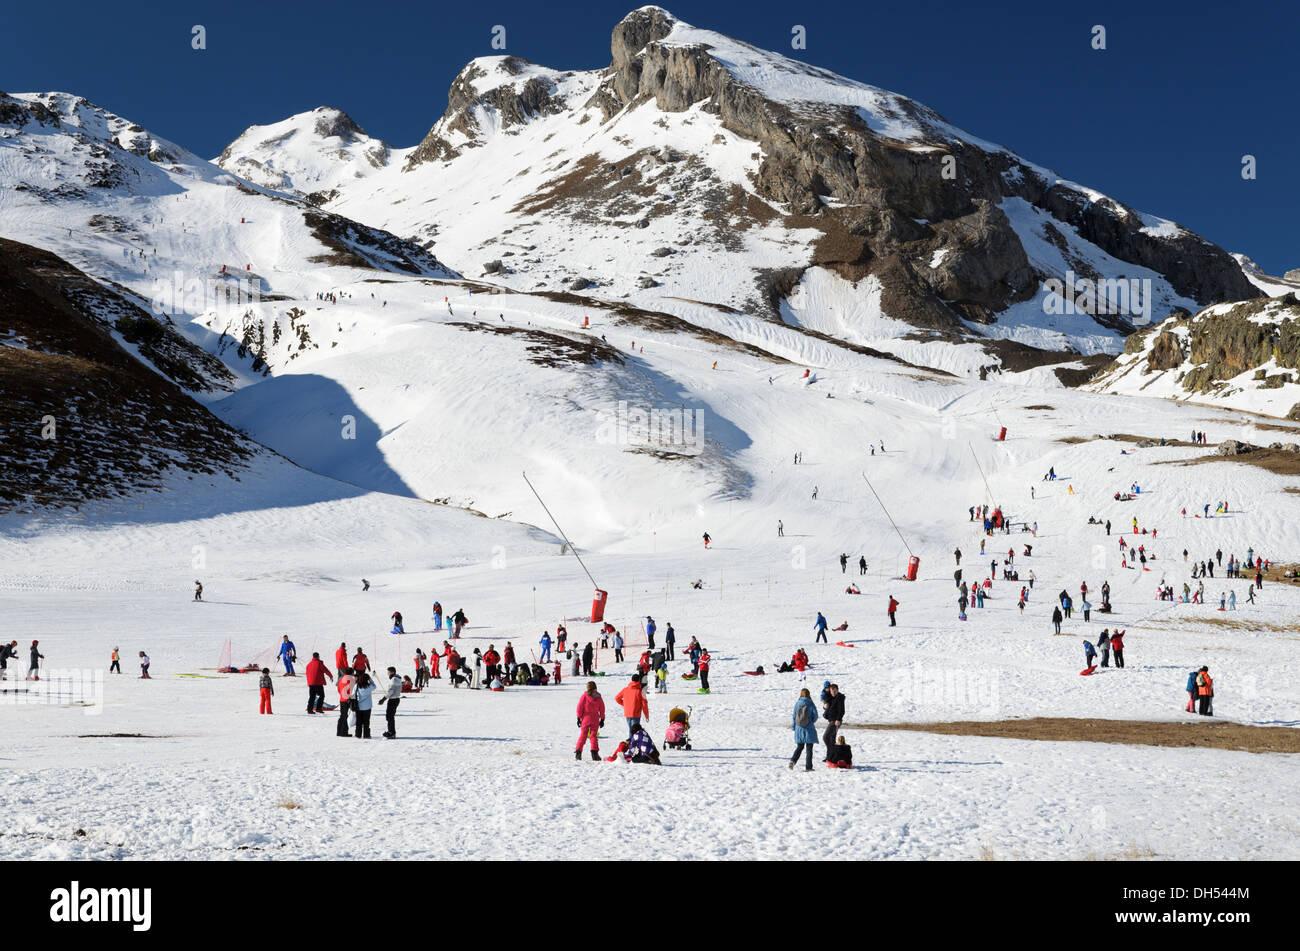 Formigal ski resort in the winter Pyrenees - Stock Image